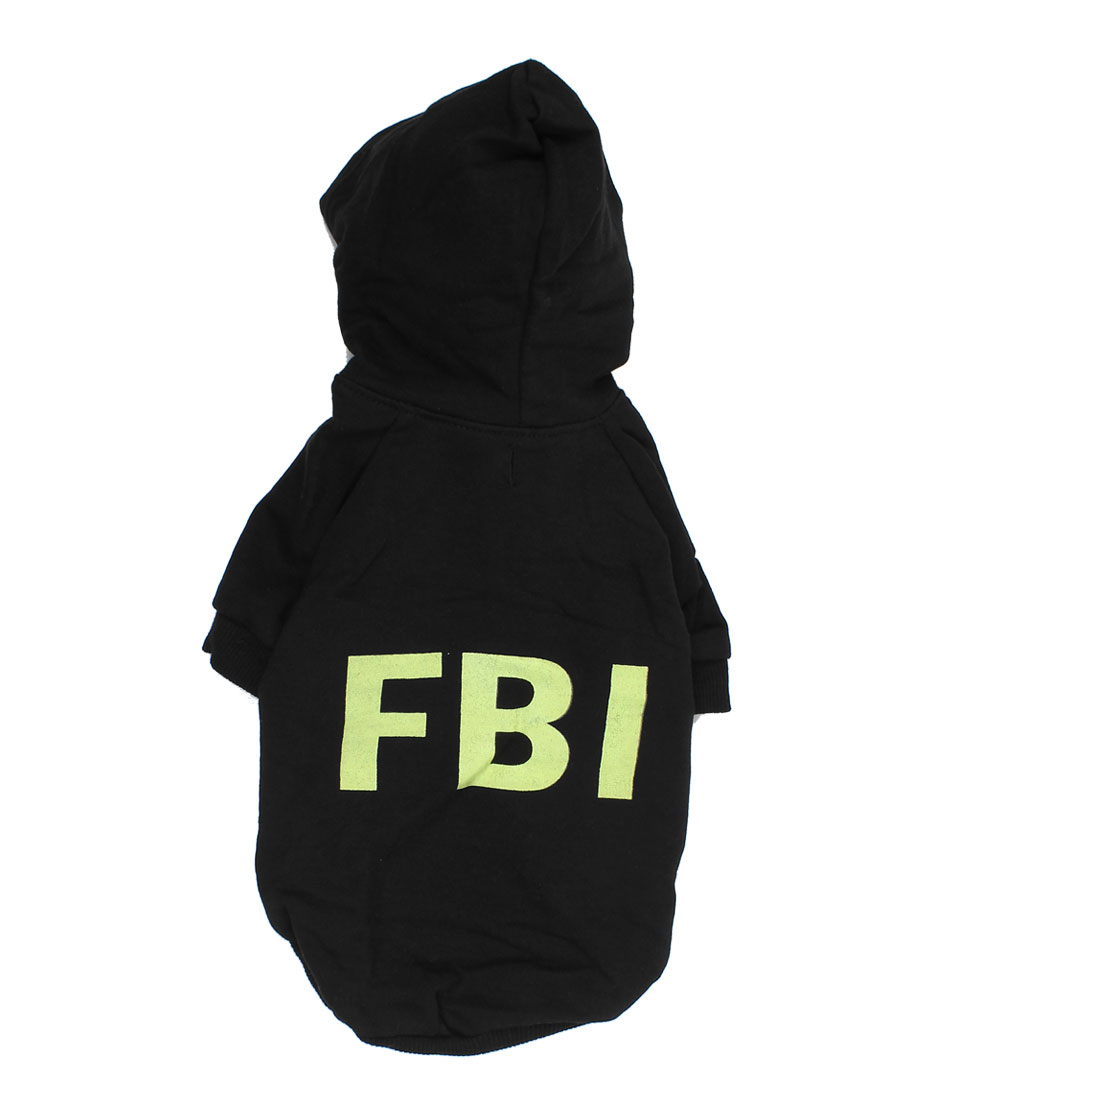 FBI Pet Doggie Yorkie Autumn Clothing Hoodie Coat Apparel Costume Black Size S